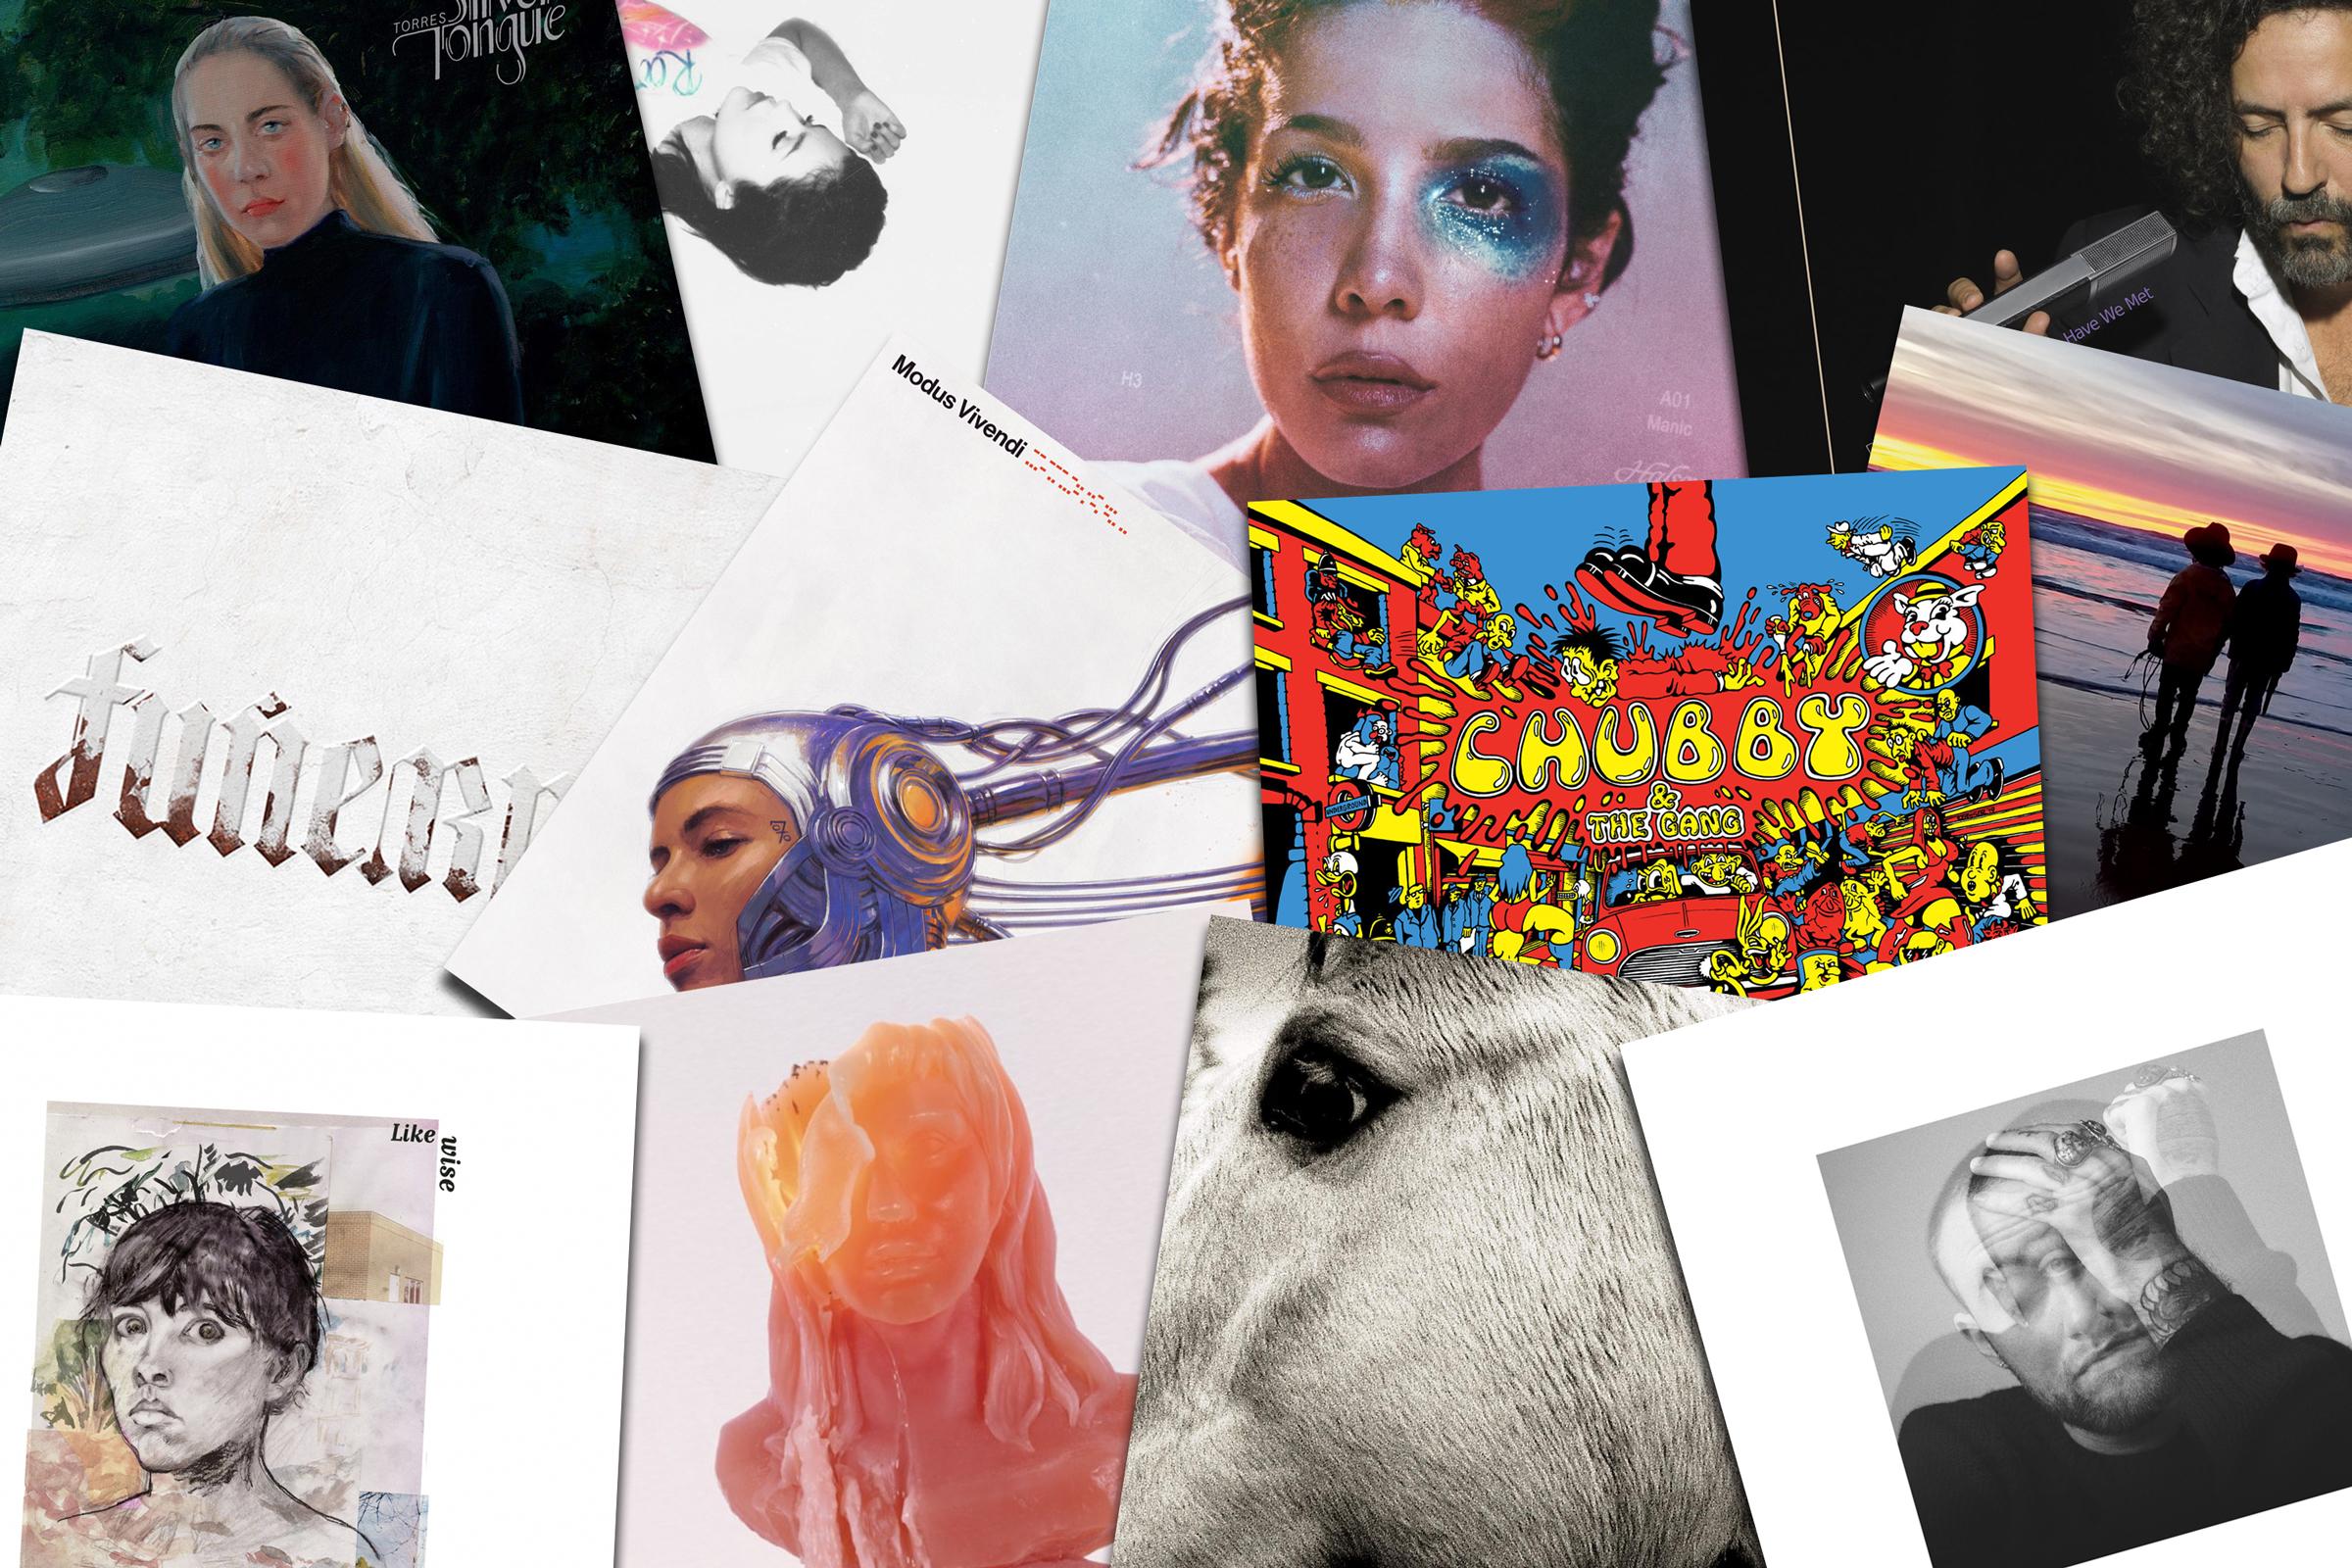 Best Albums of January 2020: Selena Gomez, Kesha, Halsey - Rolling ...